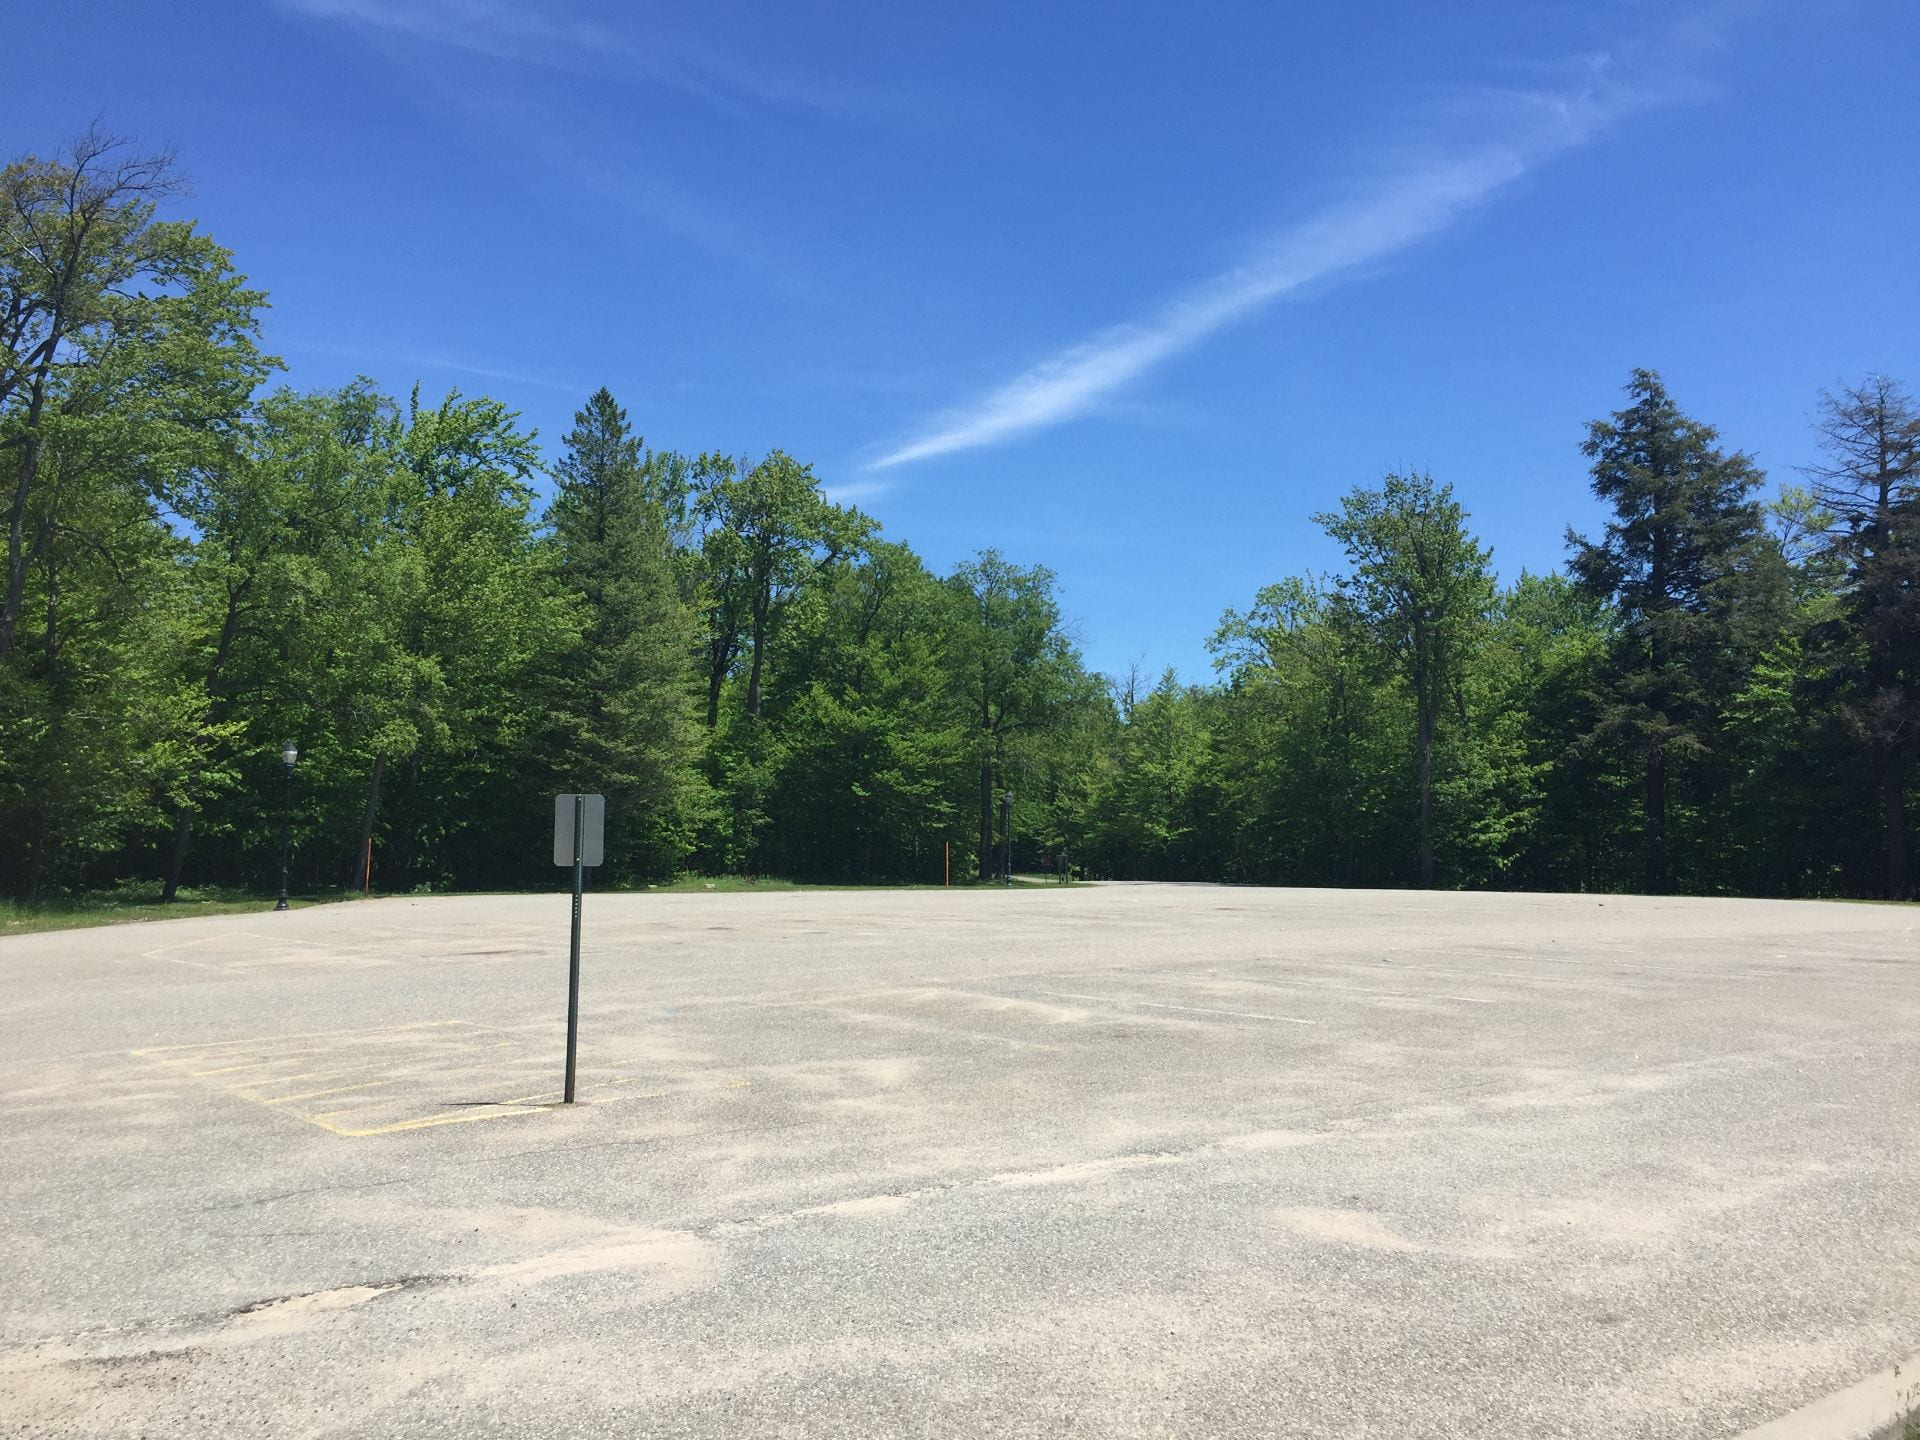 Saratoga Parking Area